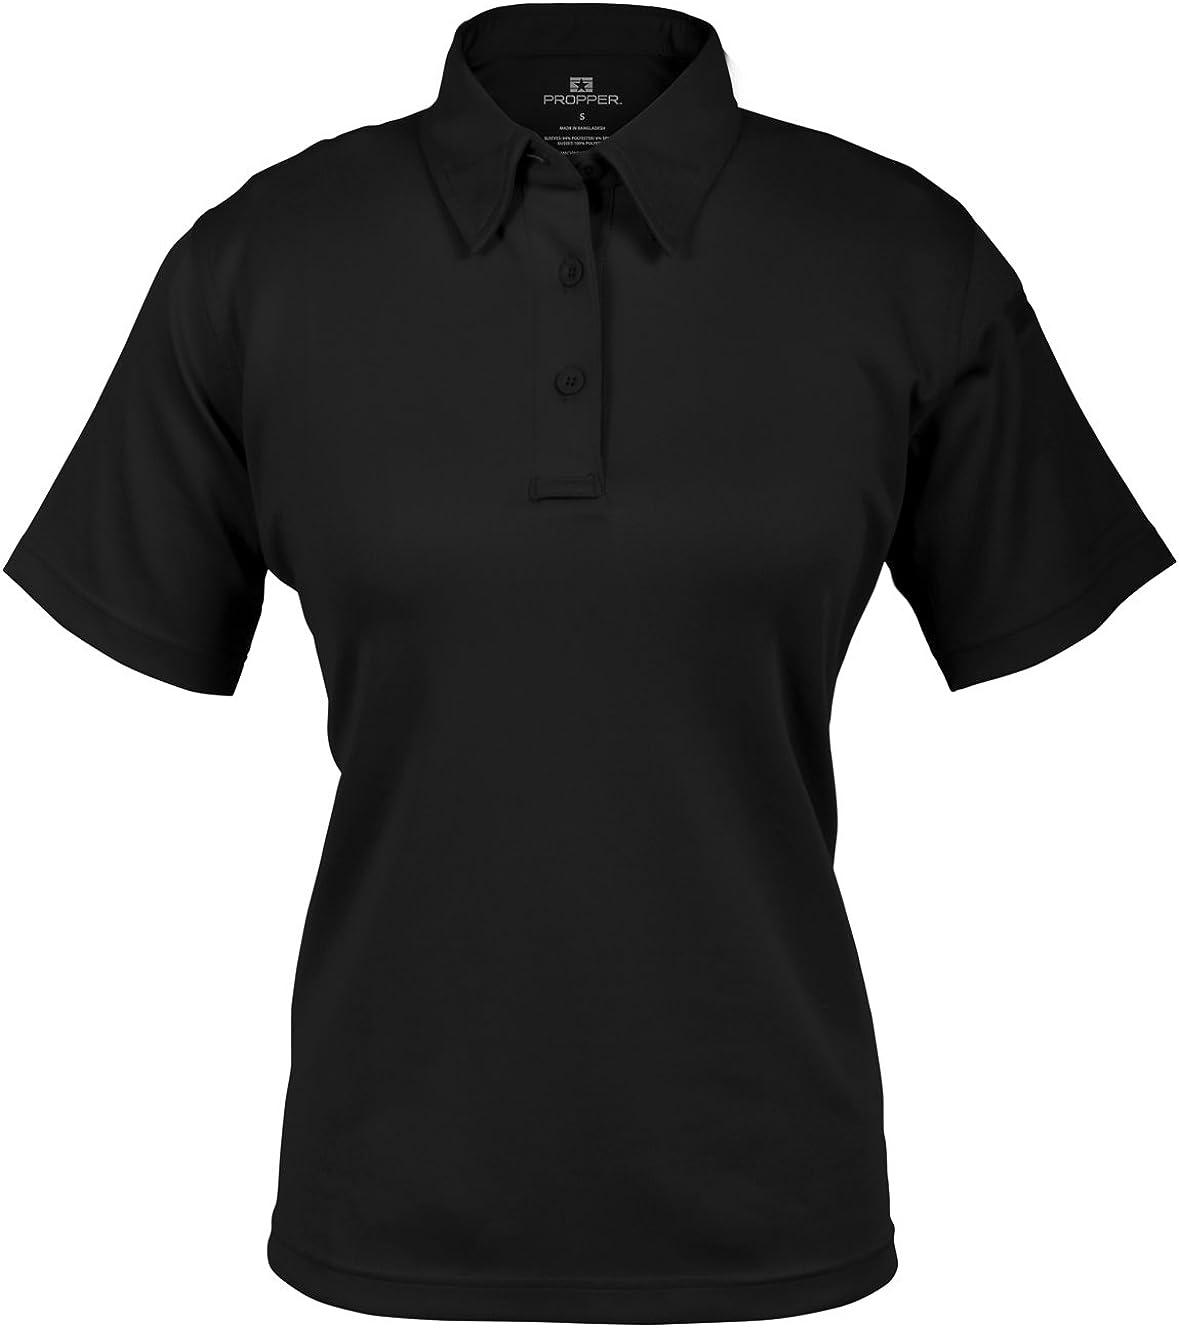 Propper Womens I.c.e. Women's Performance Polo - Short Sleeve